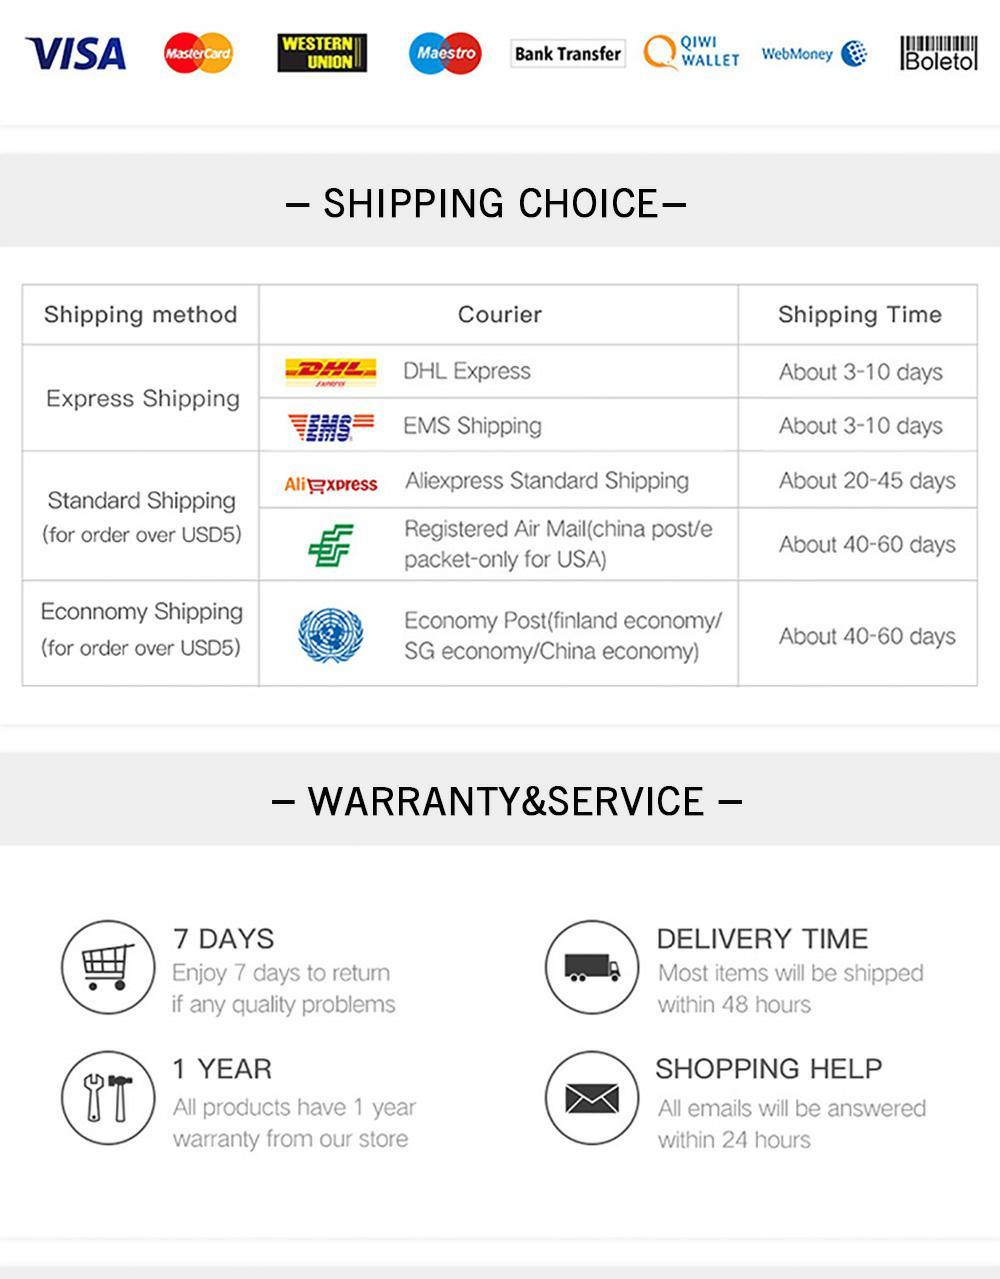 shipping choice_